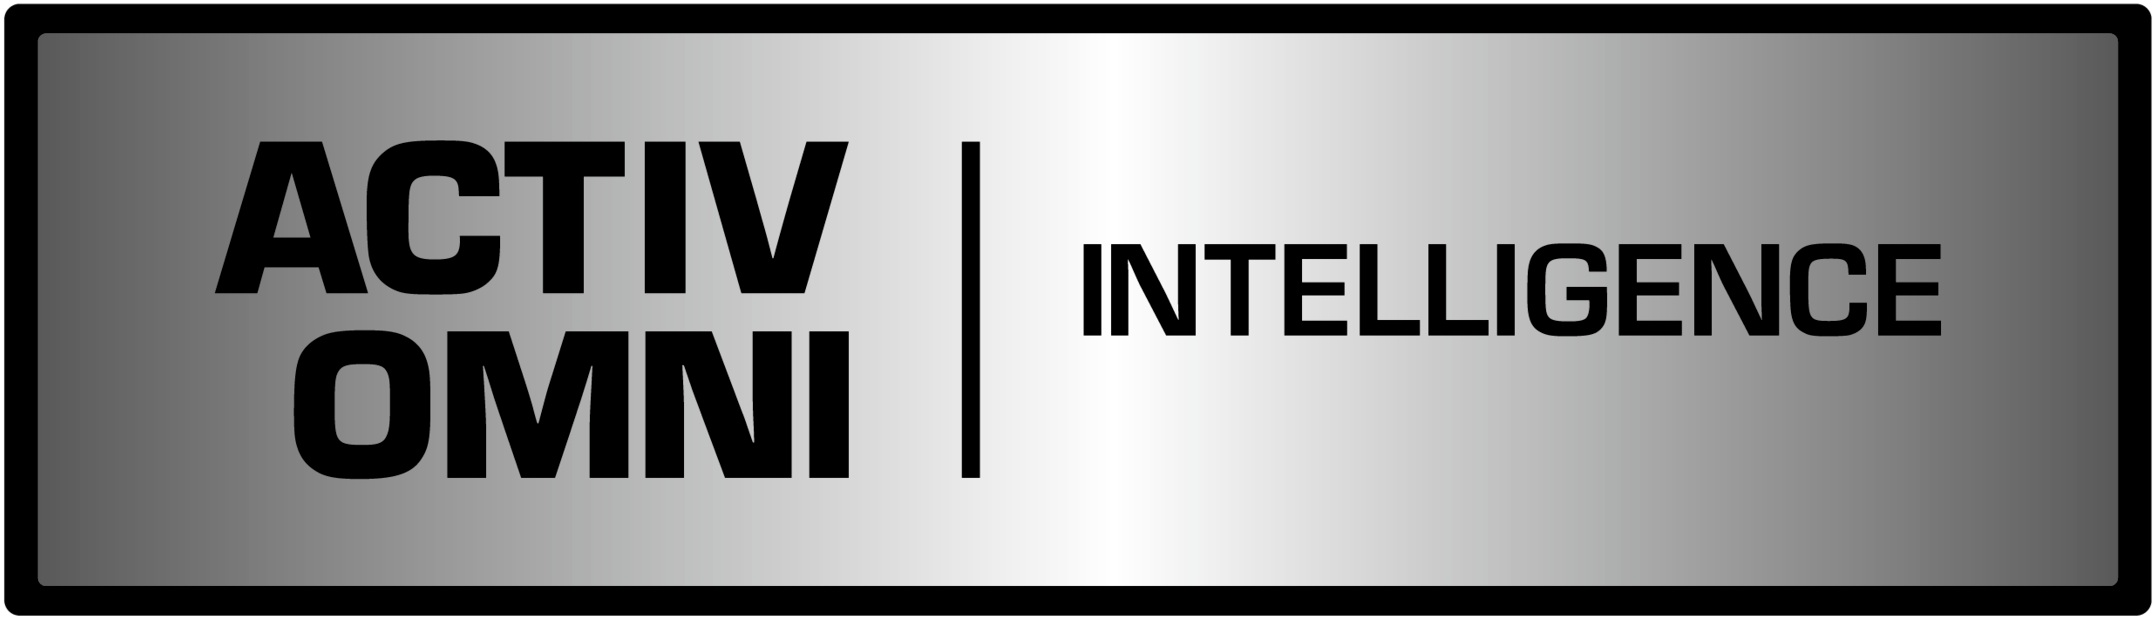 ActivOmni Intelligence